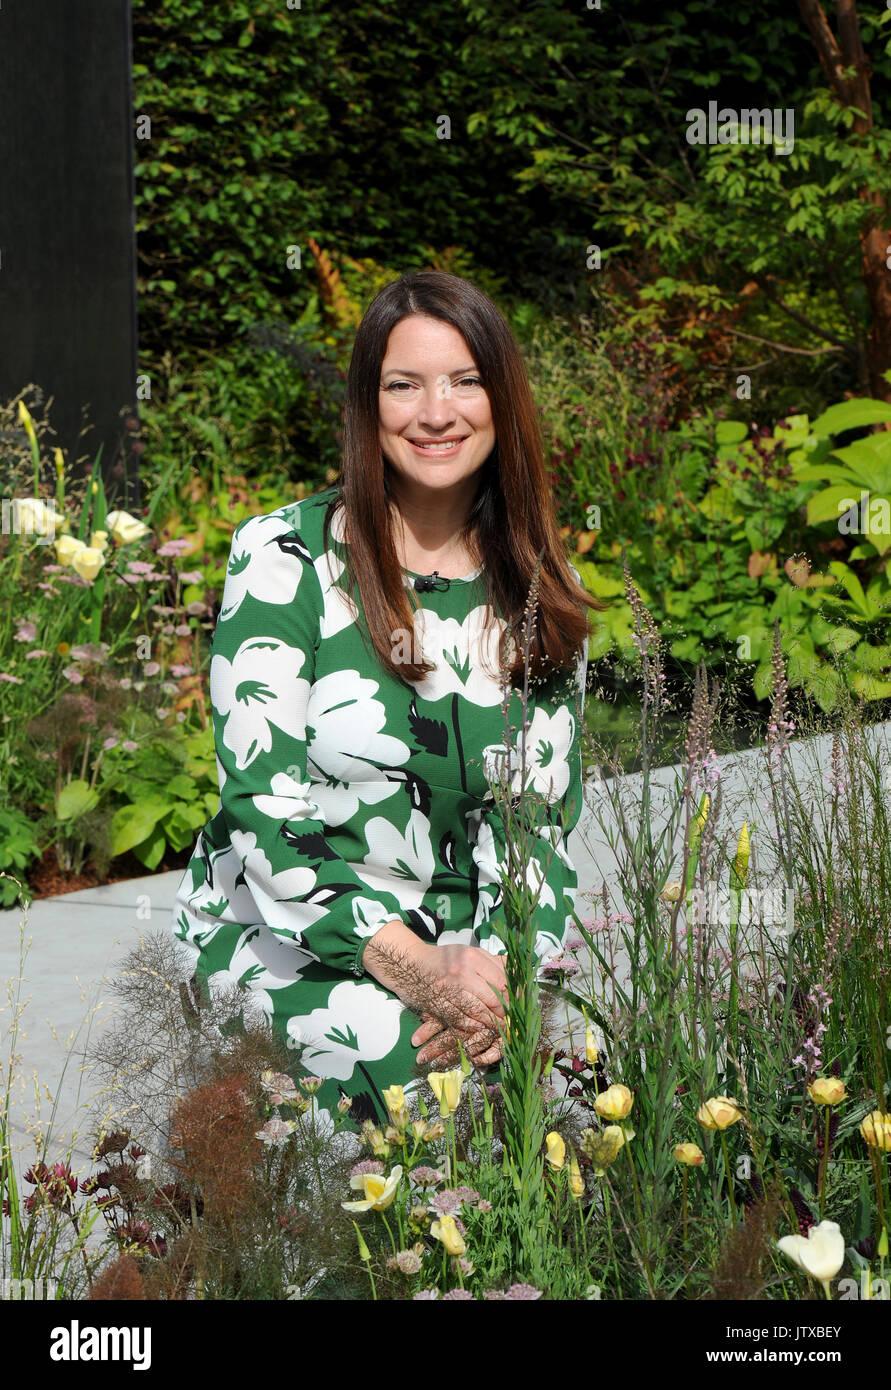 Rachel De Thame is an English gardener and television presenter on BBC's Gardeners World. - Stock Image